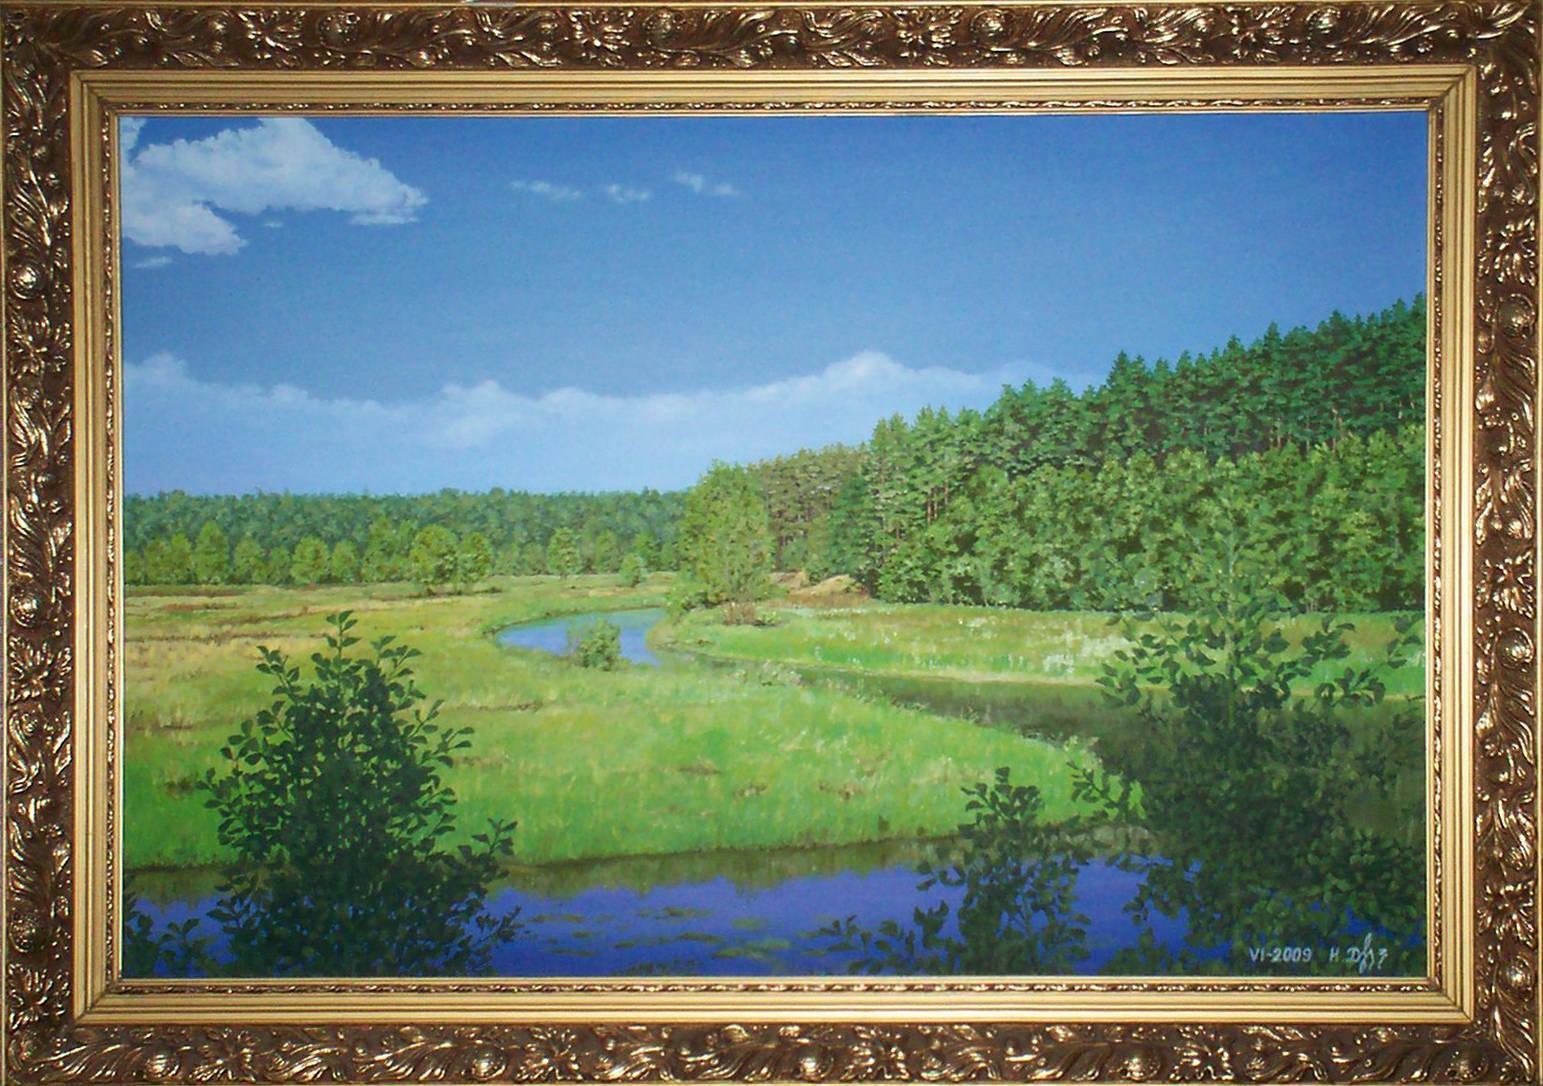 Река Гавья. Холст, масло. 2009